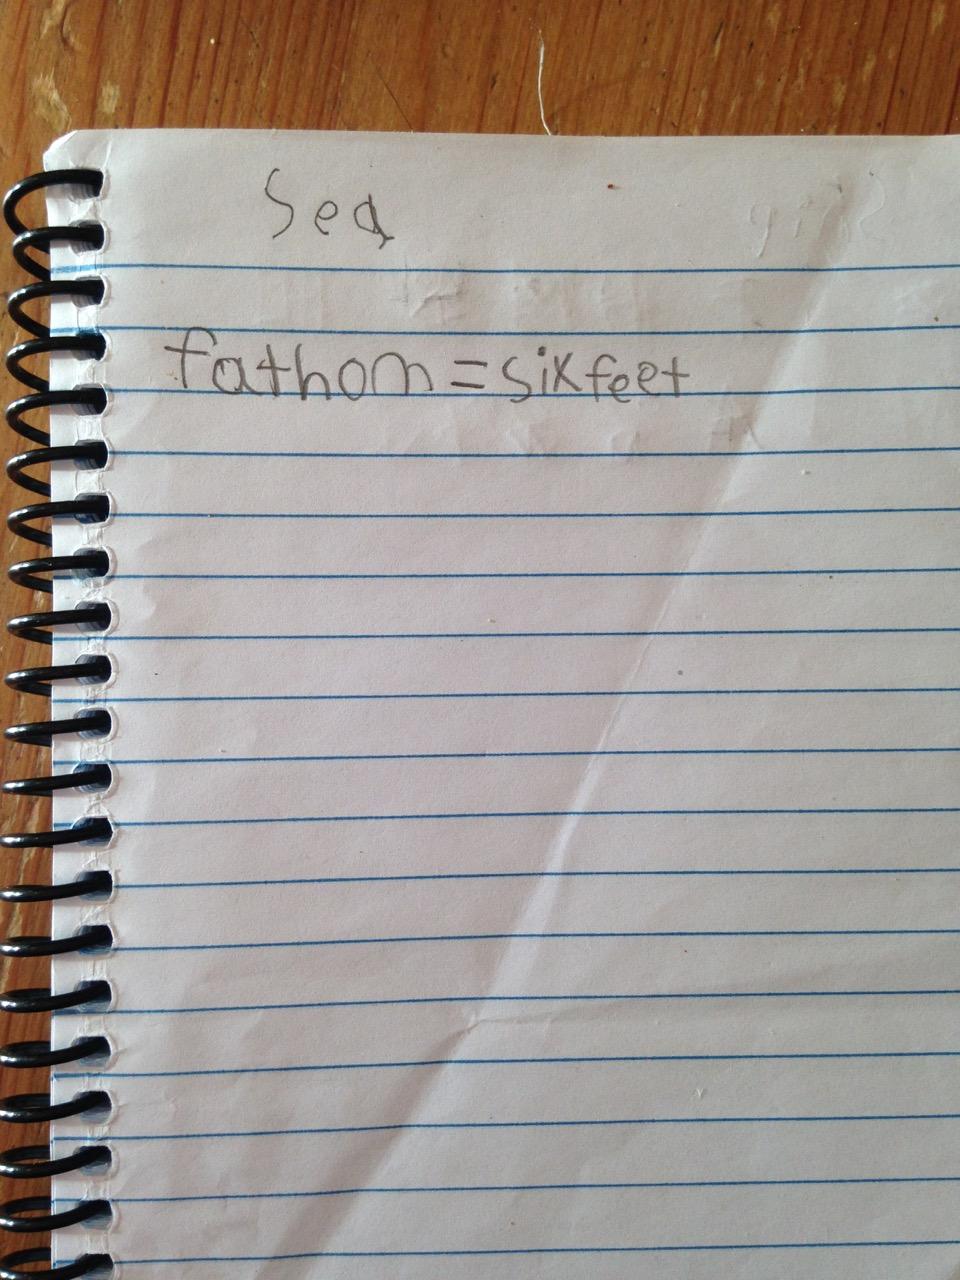 Bella's notebook.